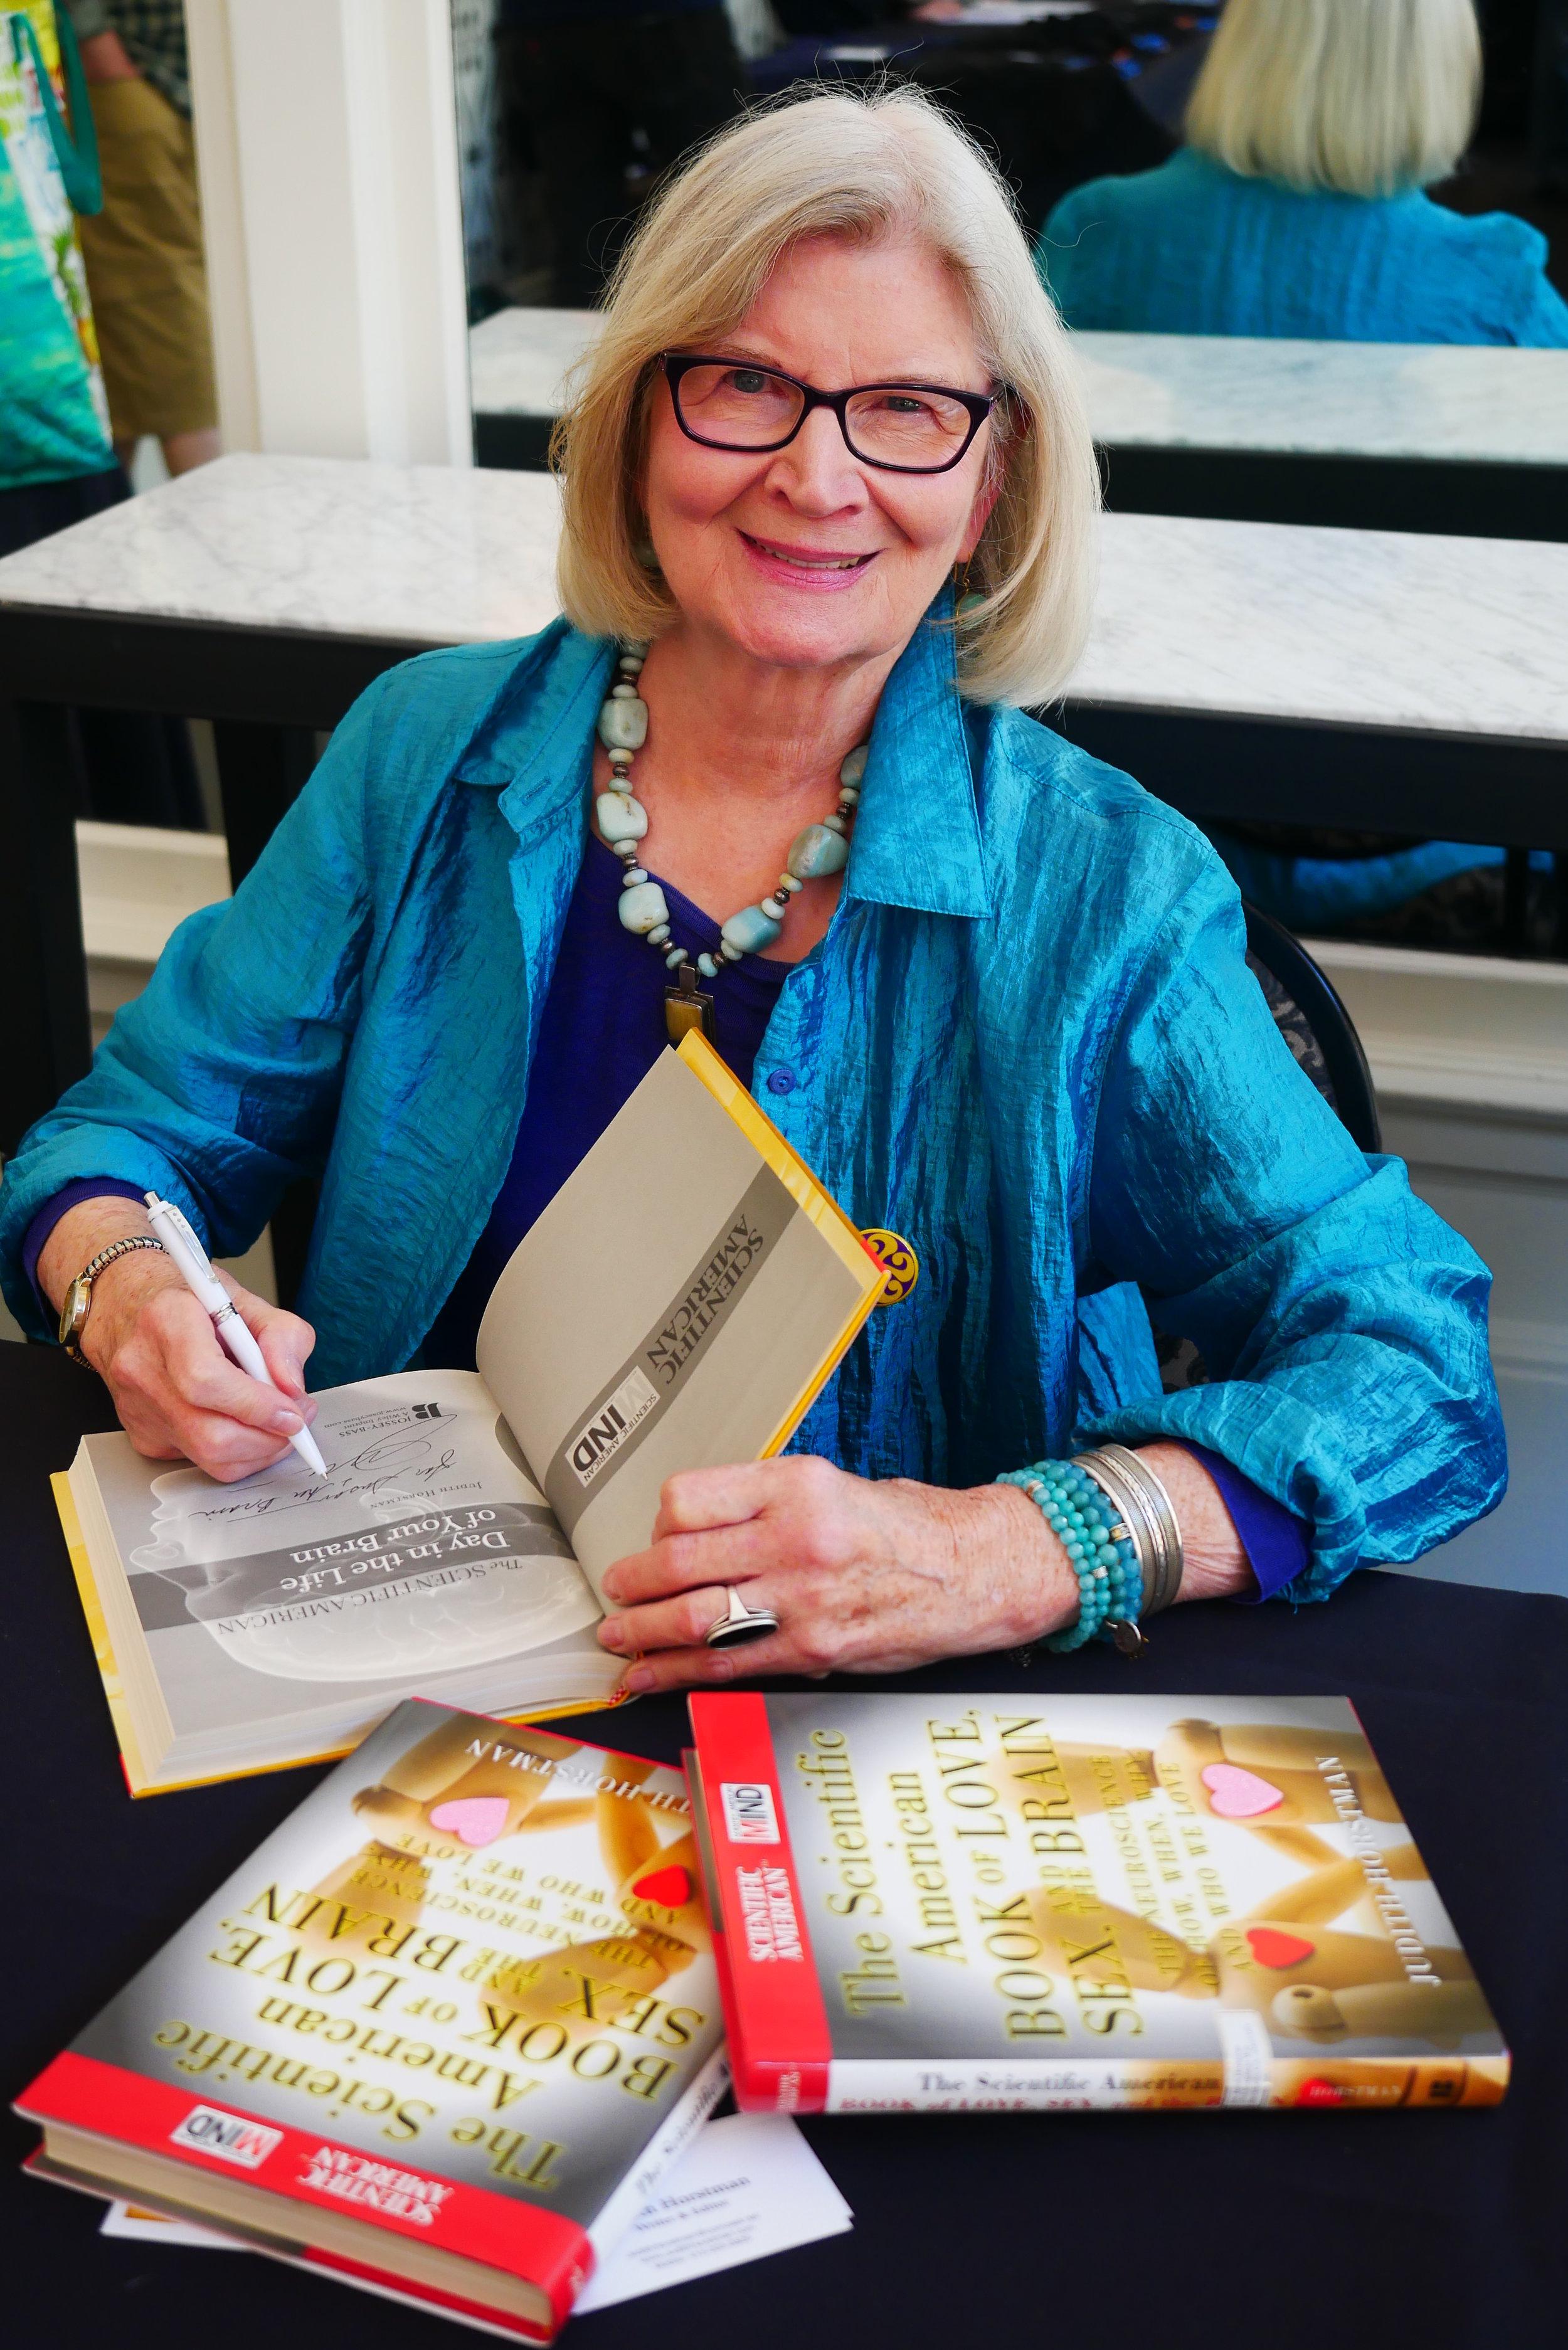 Judith Horstman, Photo by Susan Gerbic